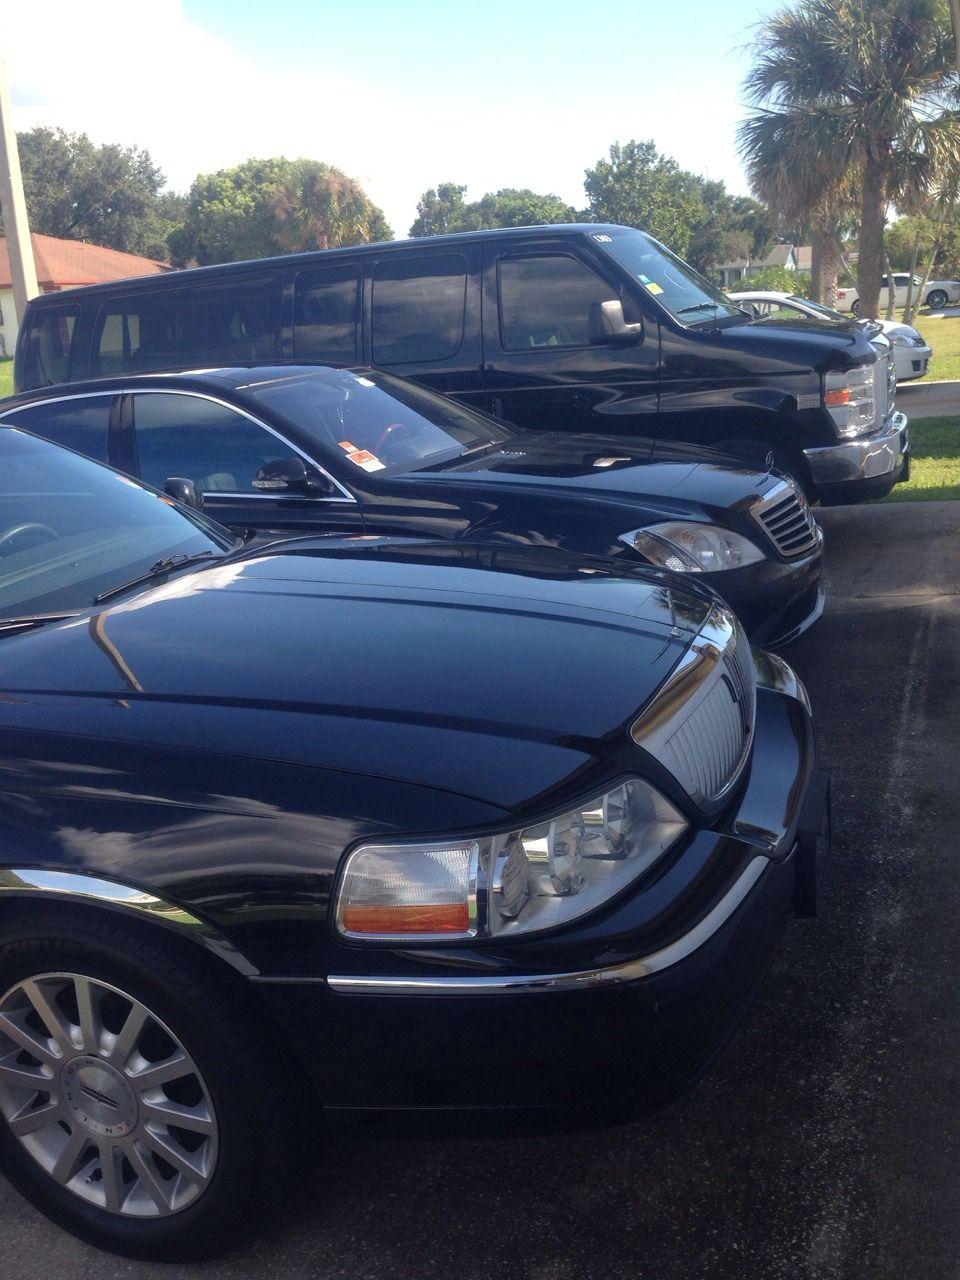 Orlando Limo Town car service, Luxury van